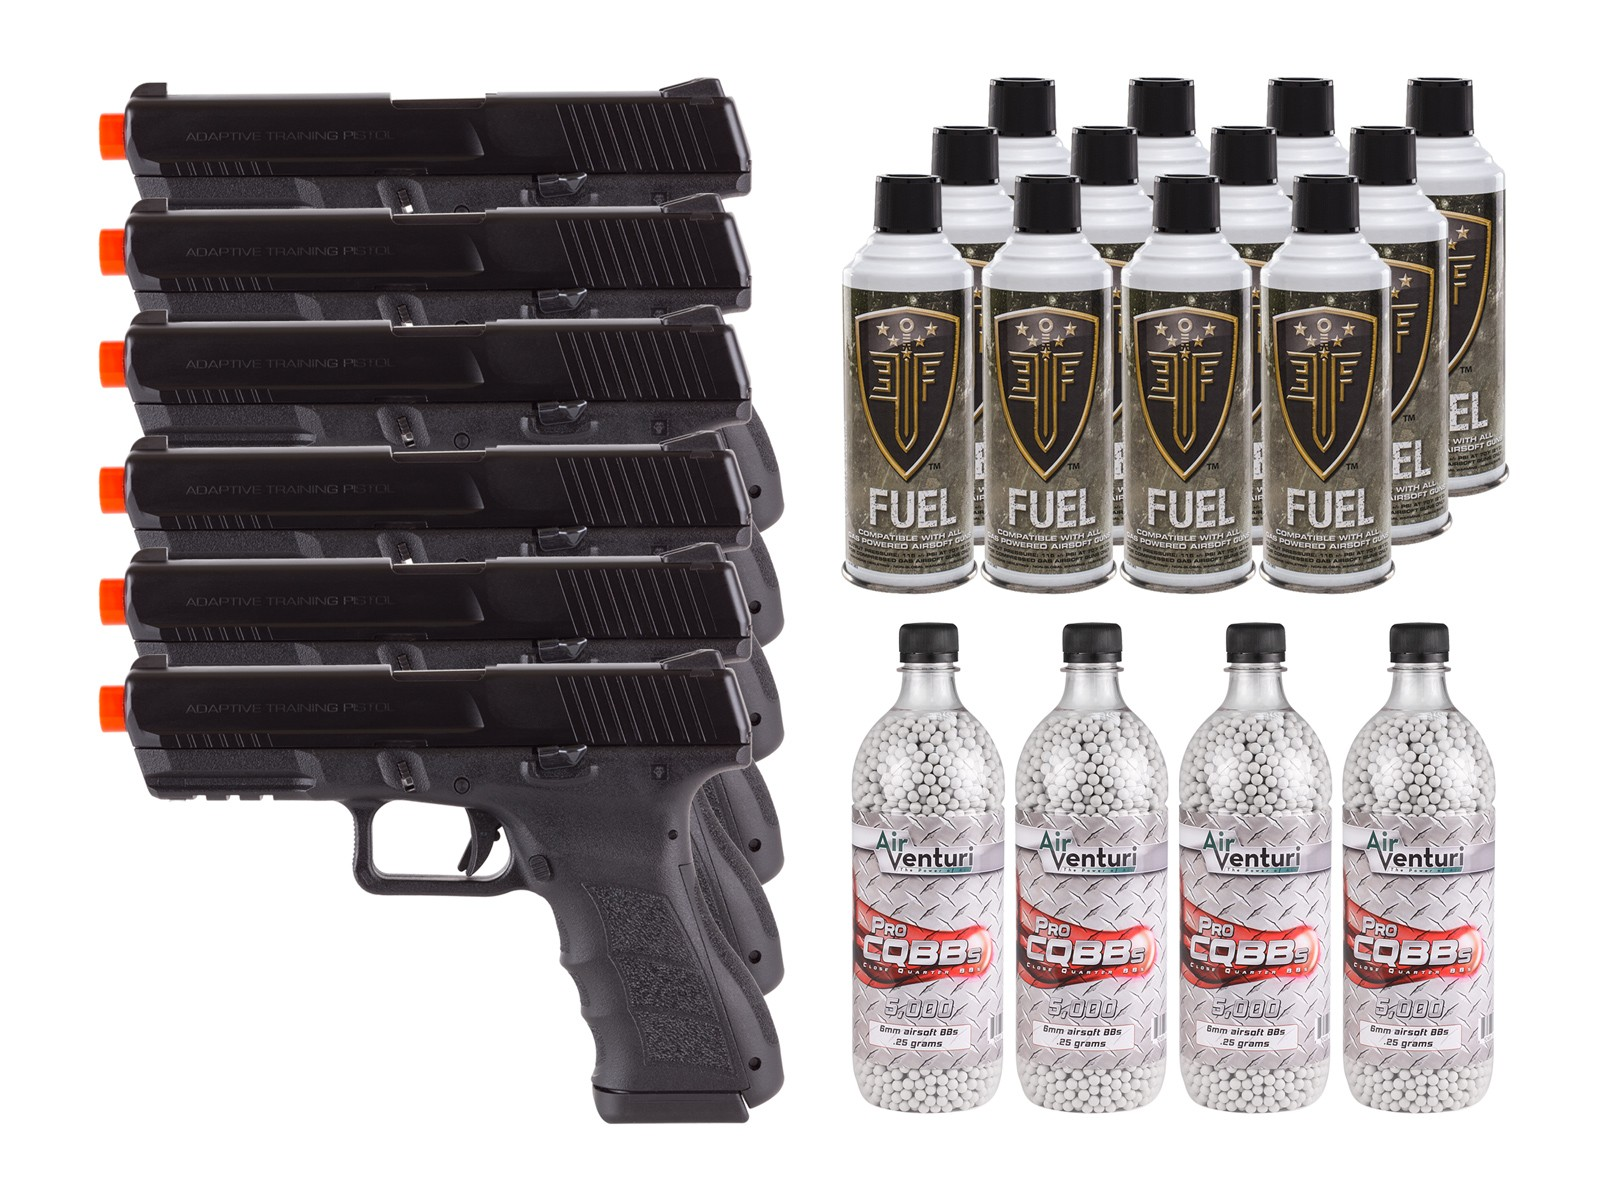 KWA_ATP_Adaptive_Training_Airsoft_Pistol_6_Pack_6mm